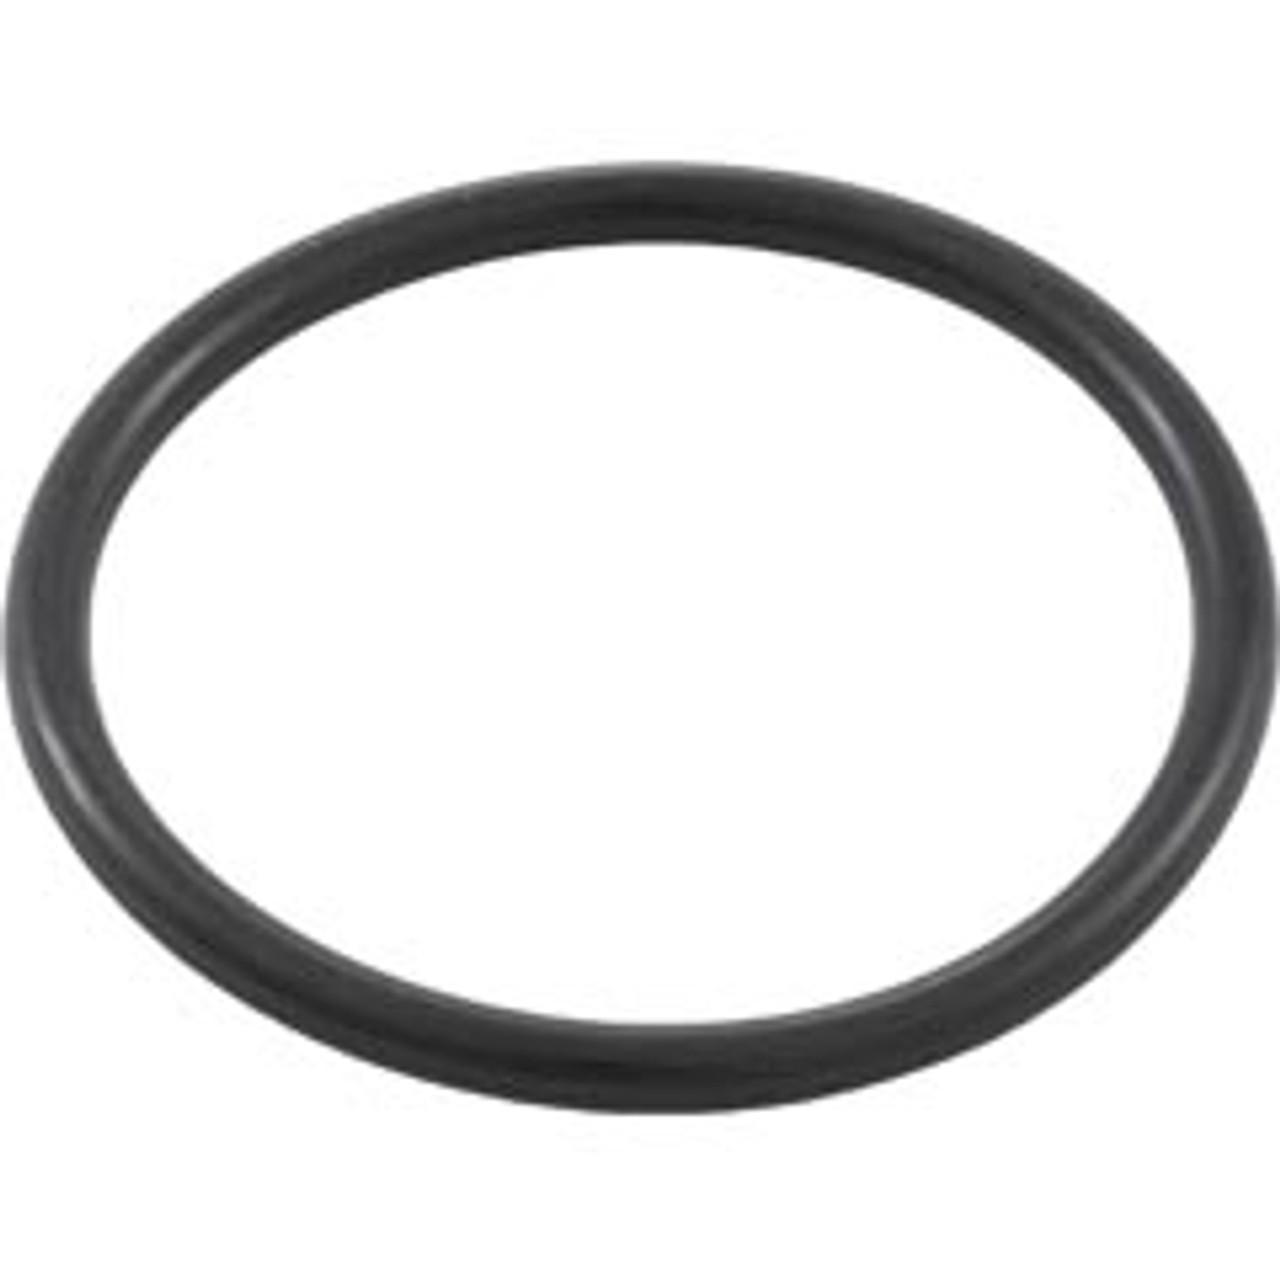 "Waterway 1 1/2"" O-Ring, Multiple Uses, 805-0224"